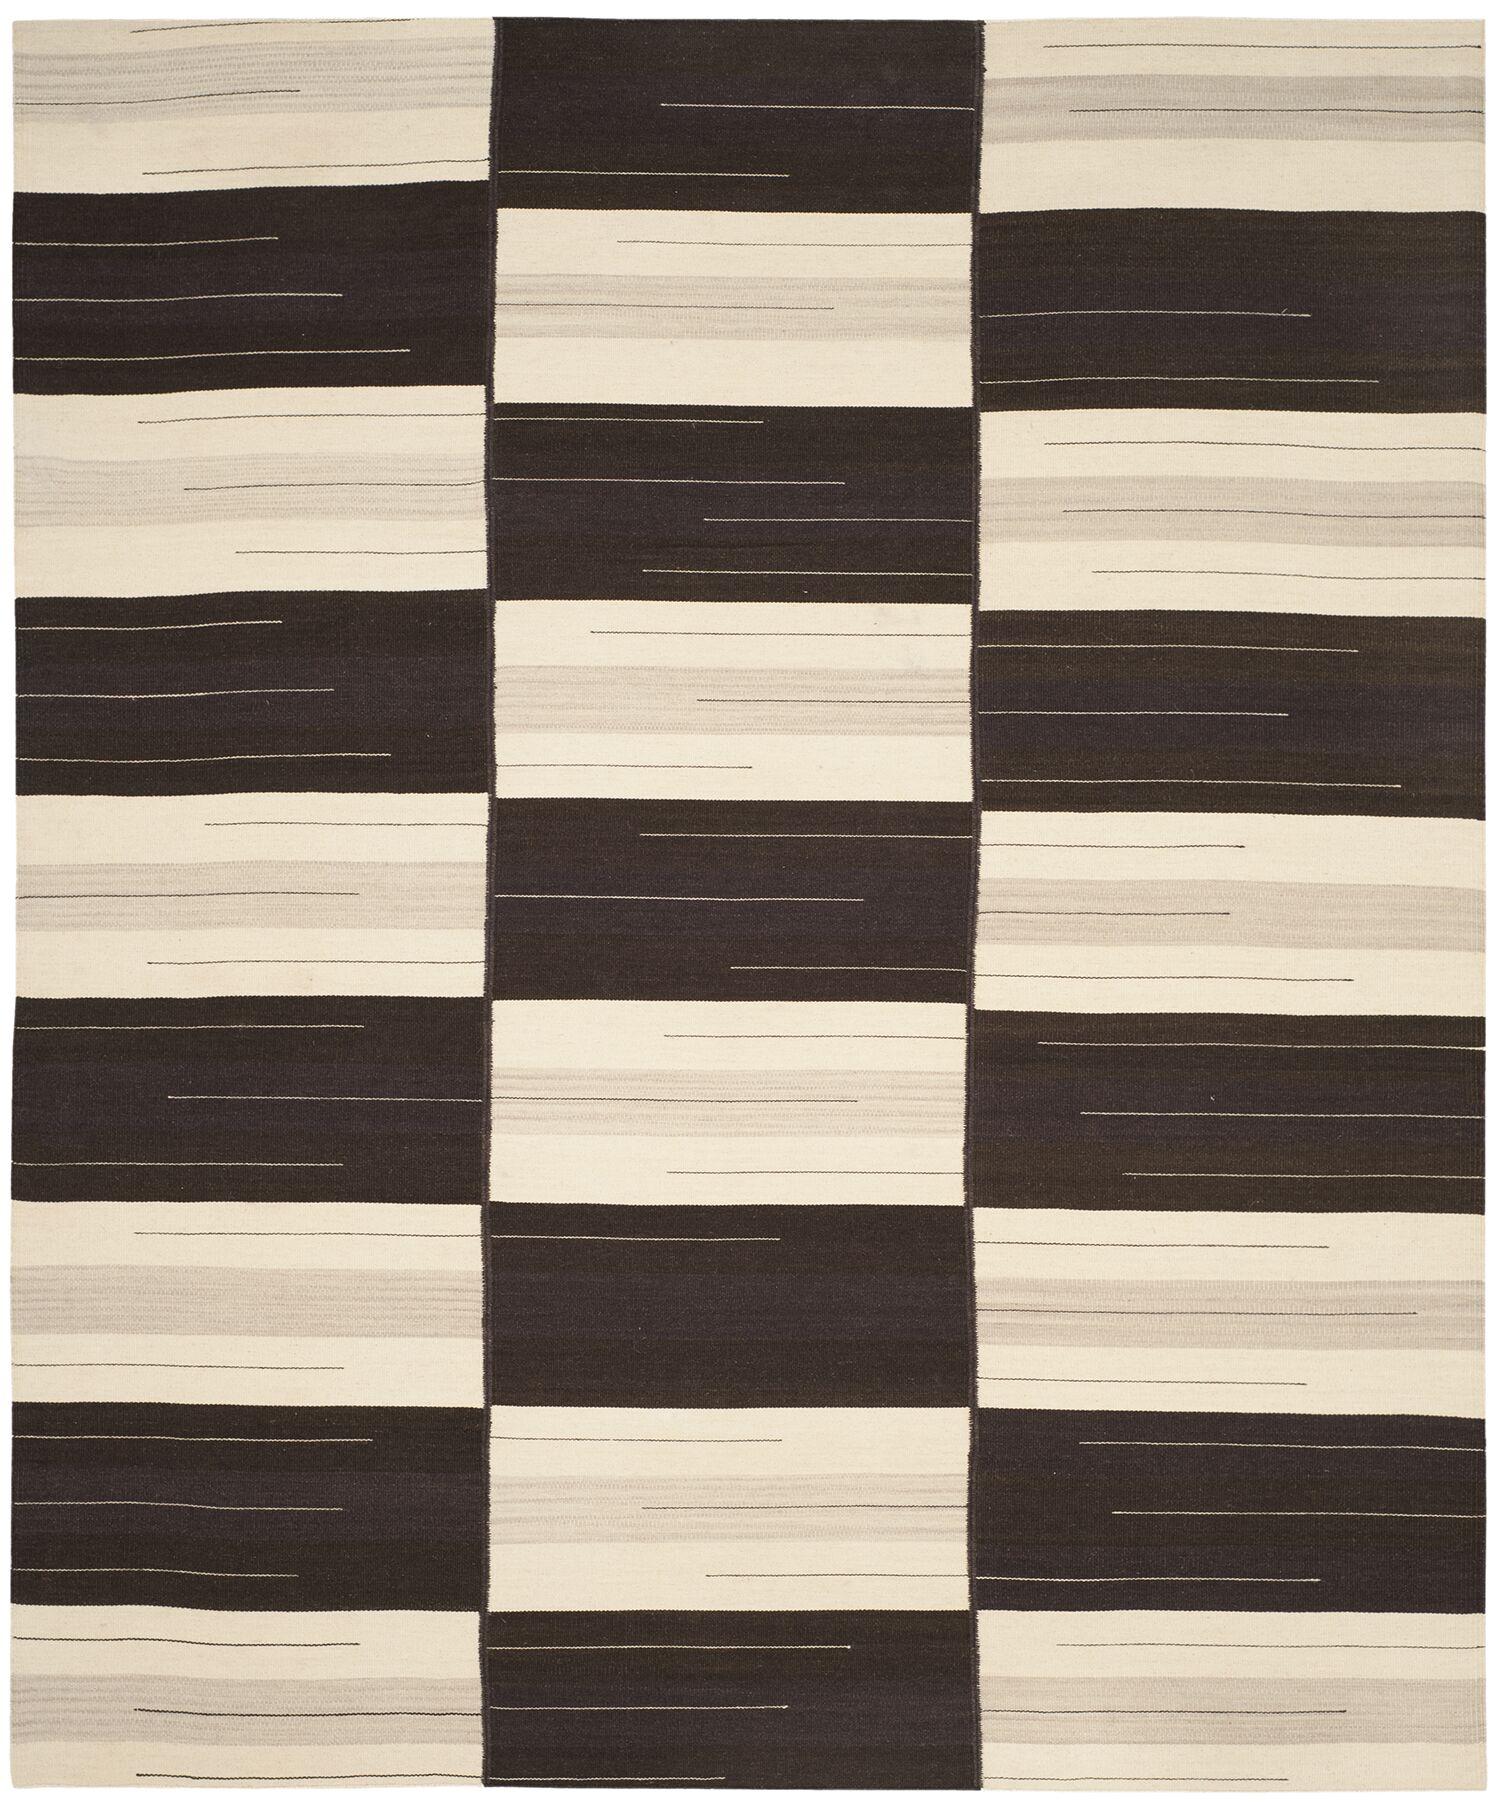 Amerina Hand-Woven Beige/Brown Area Rug Rug Size: Rectangle 8' x 10'